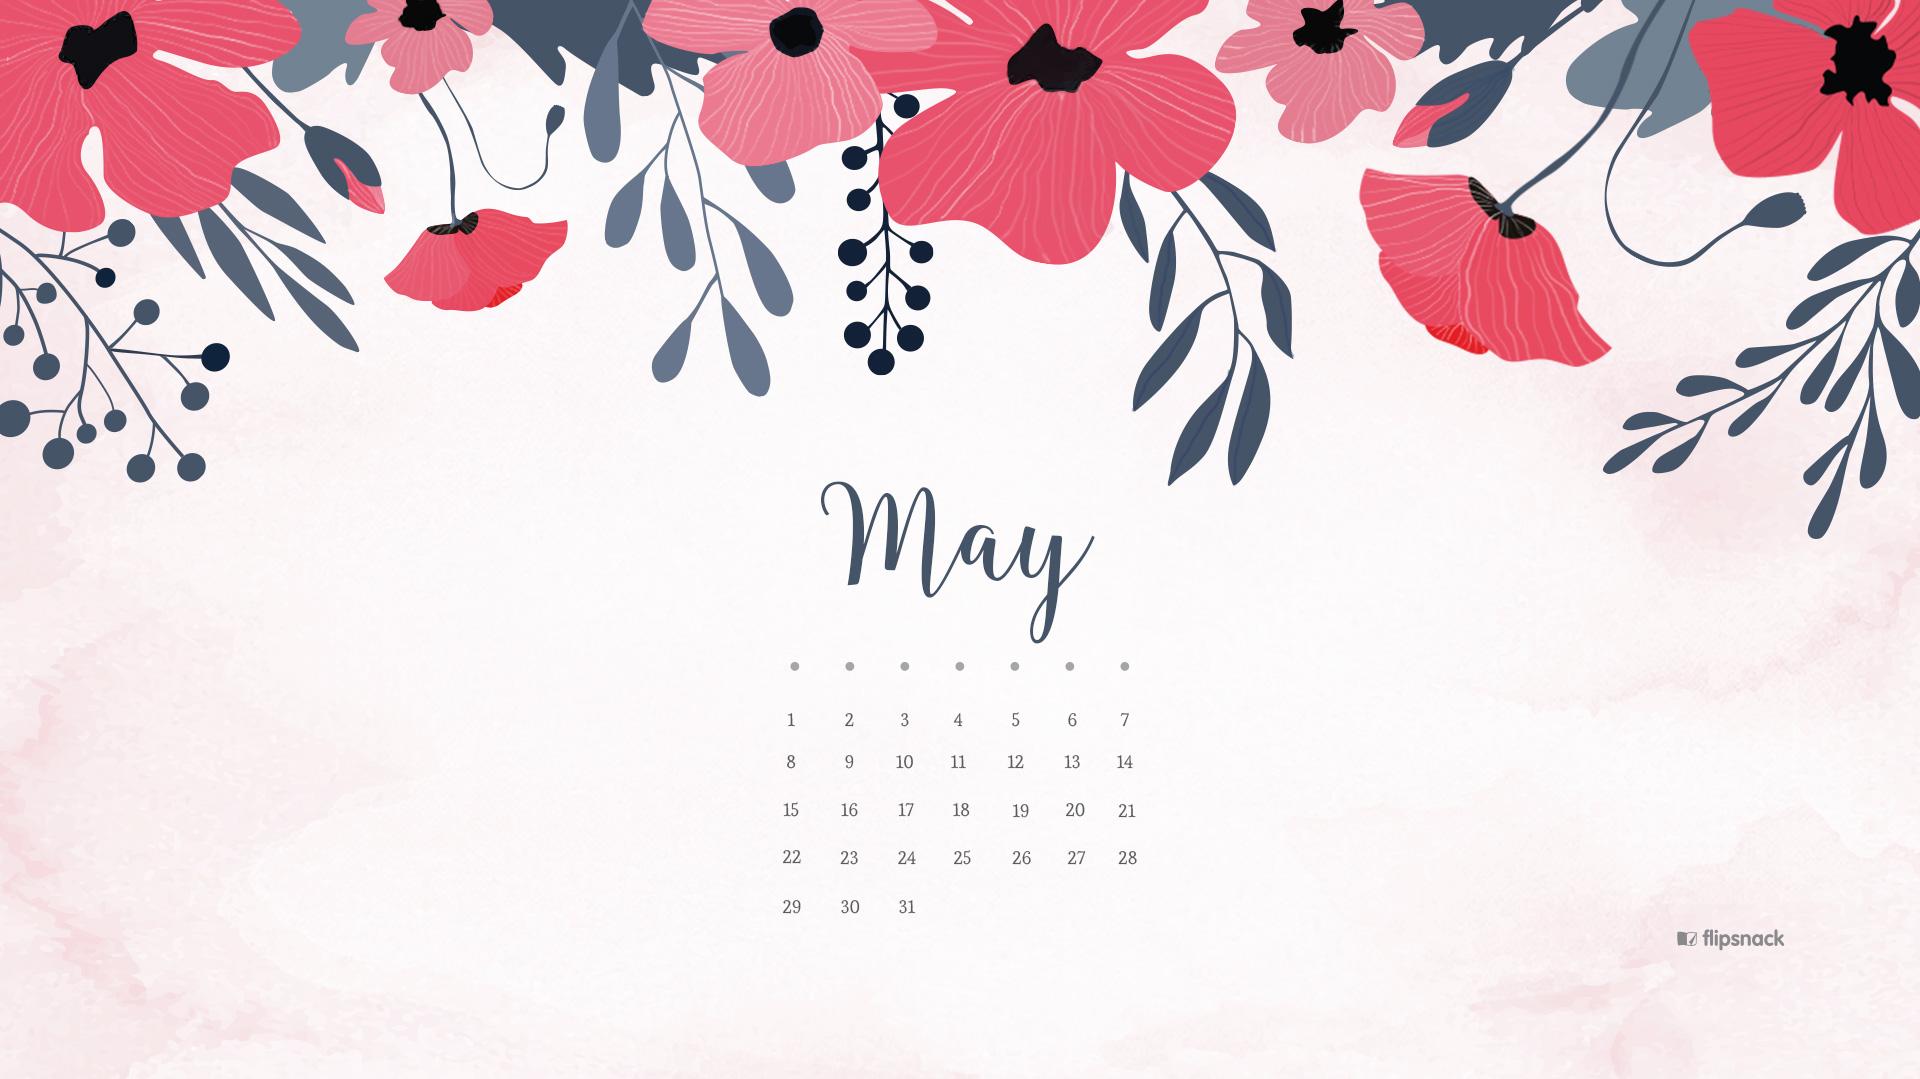 May 2019 Desktop Calendar Wallpaper 1920x1079